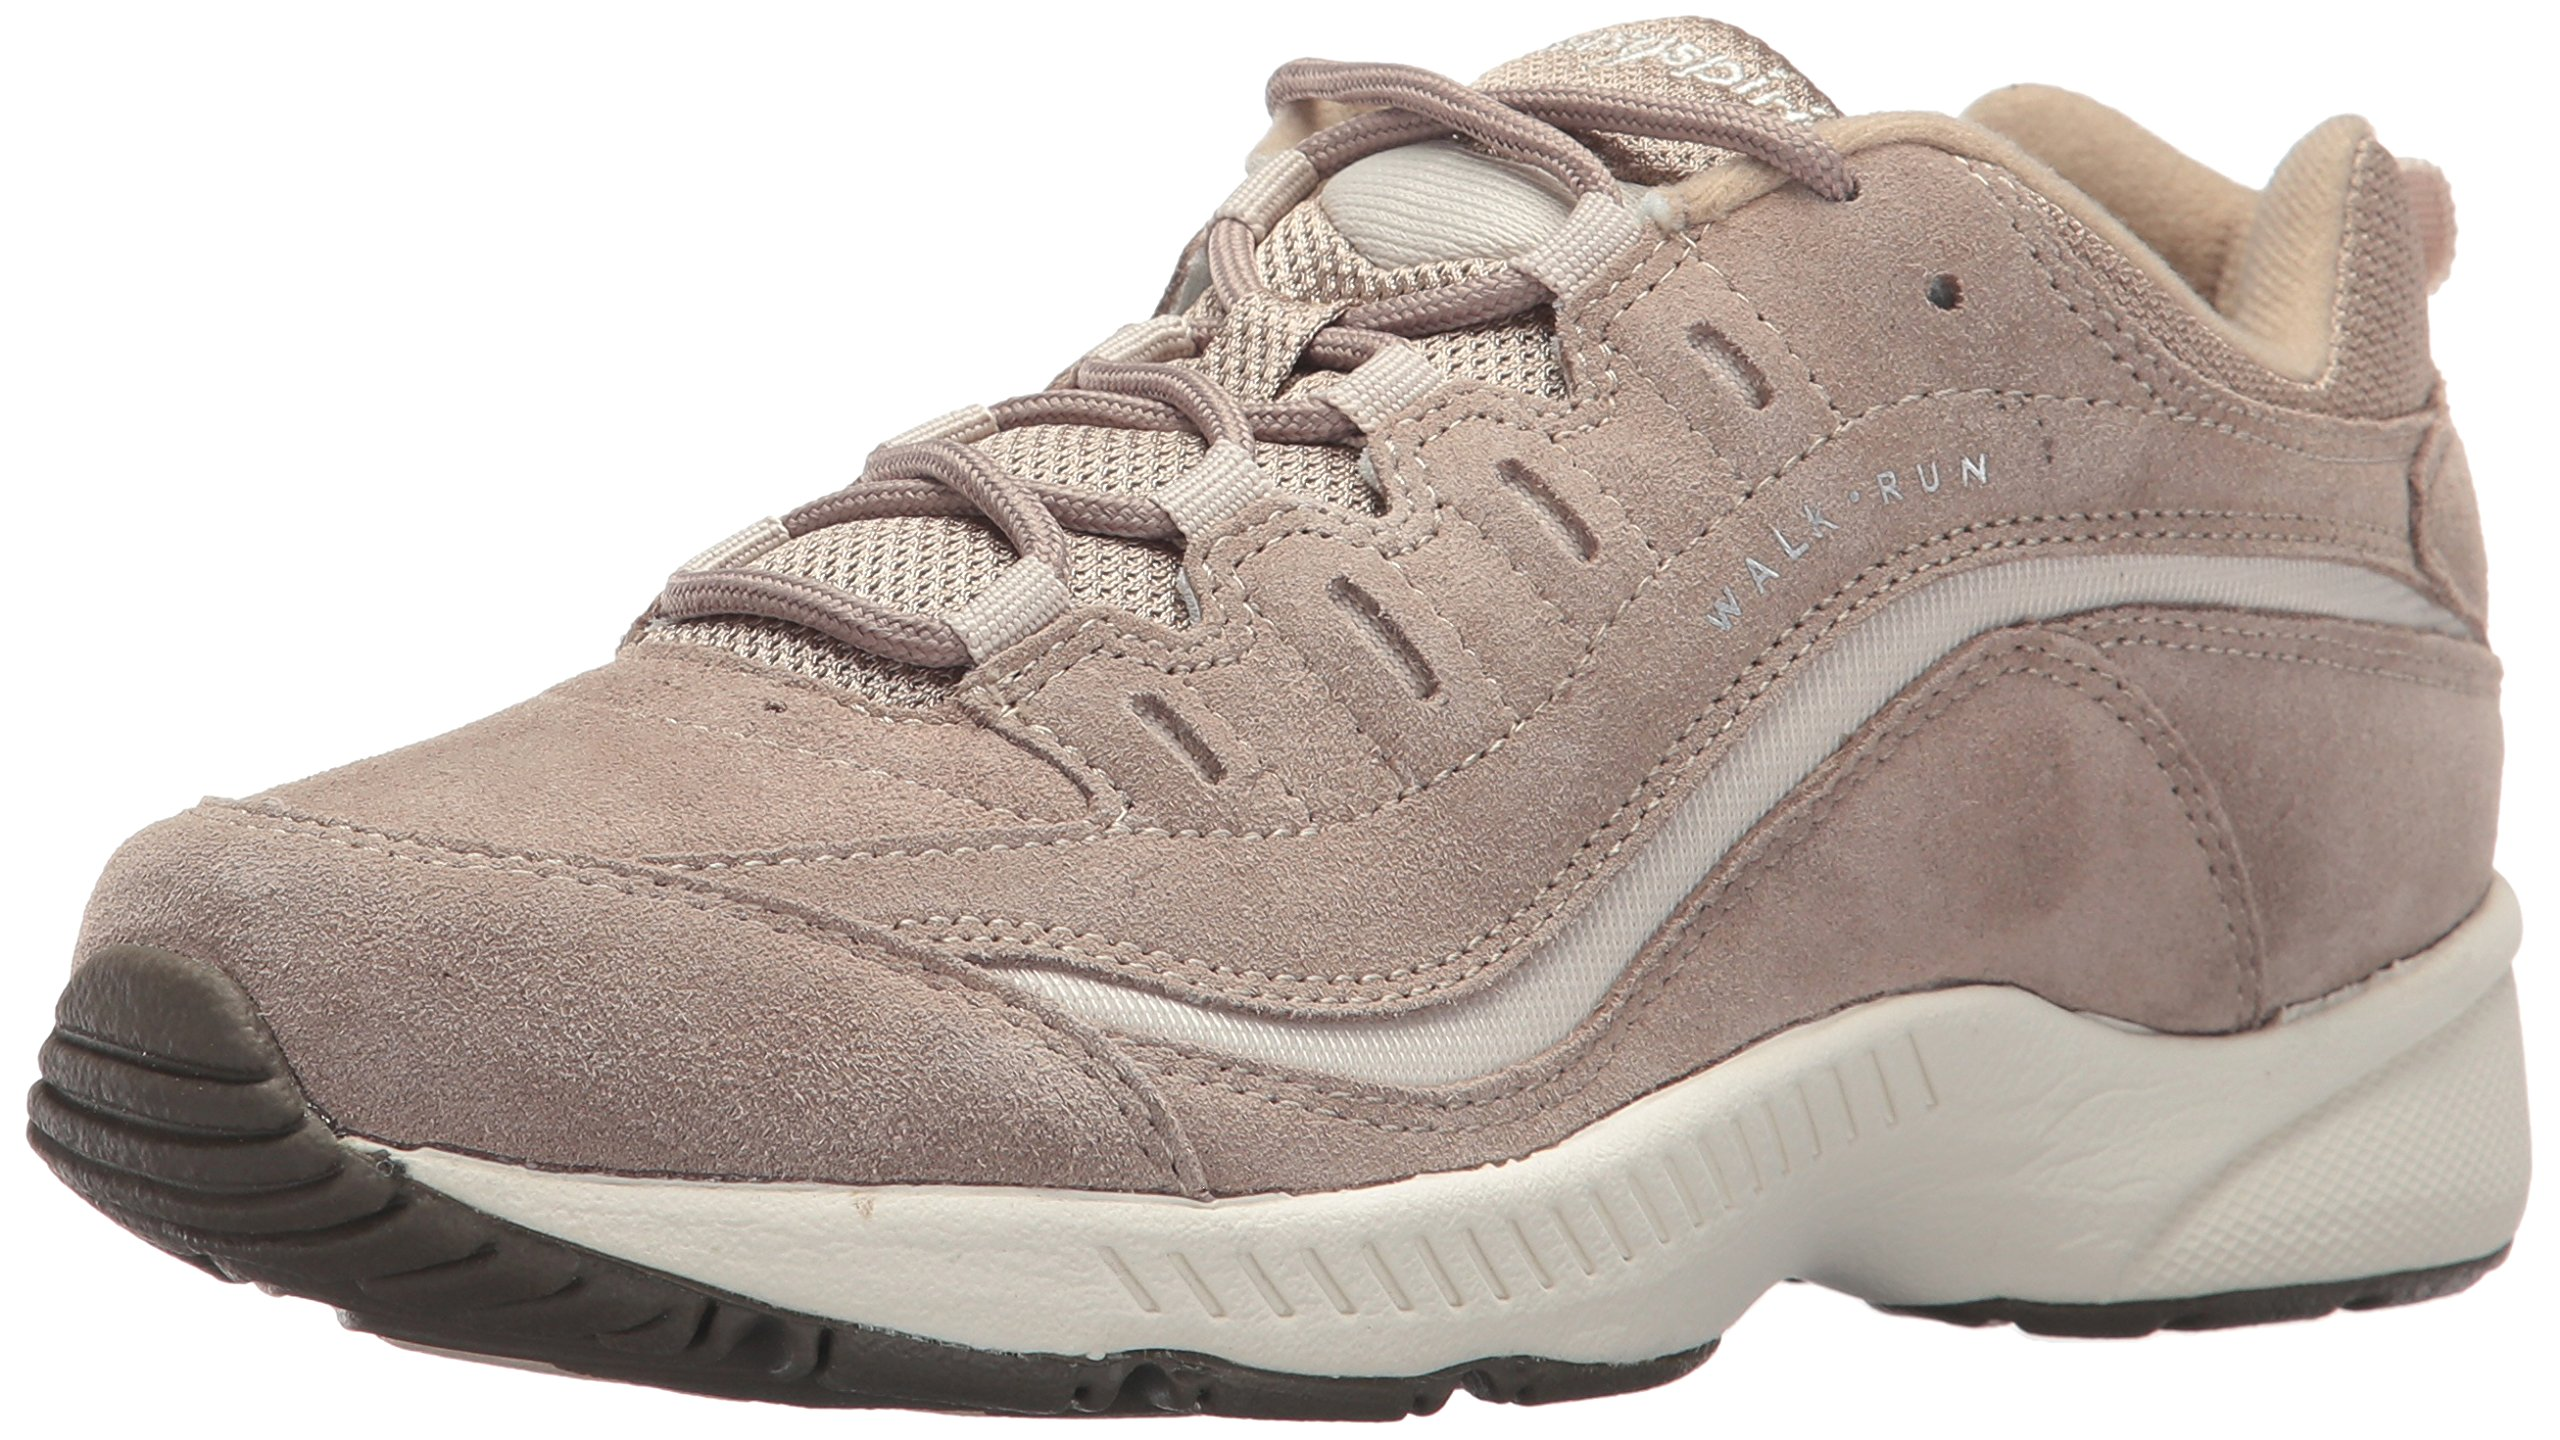 Easy Spirit Women's Romy Walking Shoe, Medium Taupe Multi Suede, 11 M US